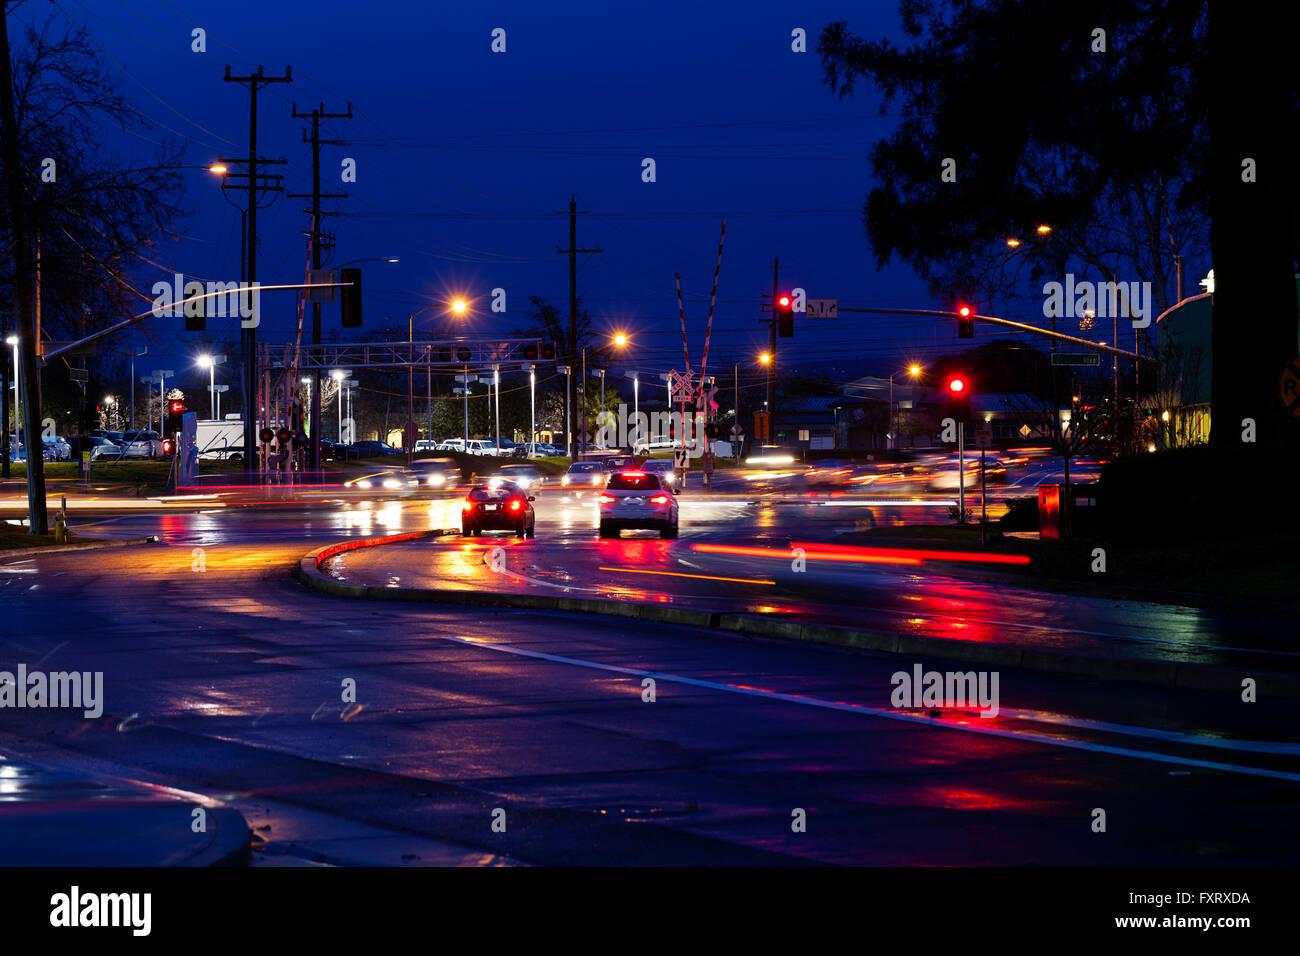 Night Street Automobile Traffic Rail Road Crossing - Stock Image